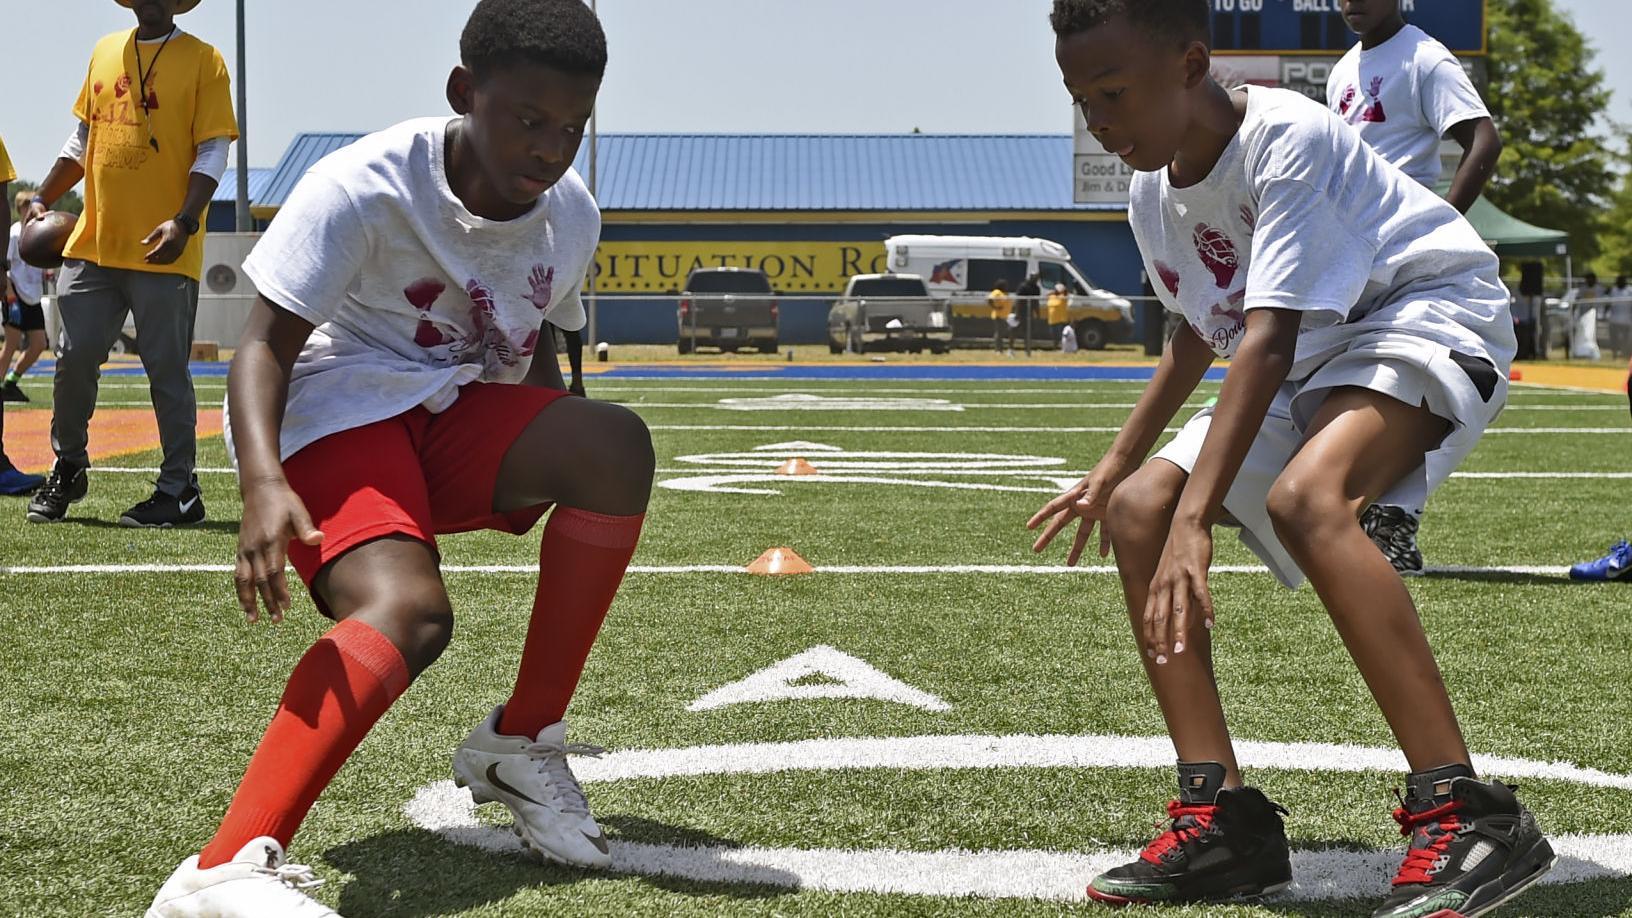 Photos: Young football players sharpen skills at Doug Williams Football Camp